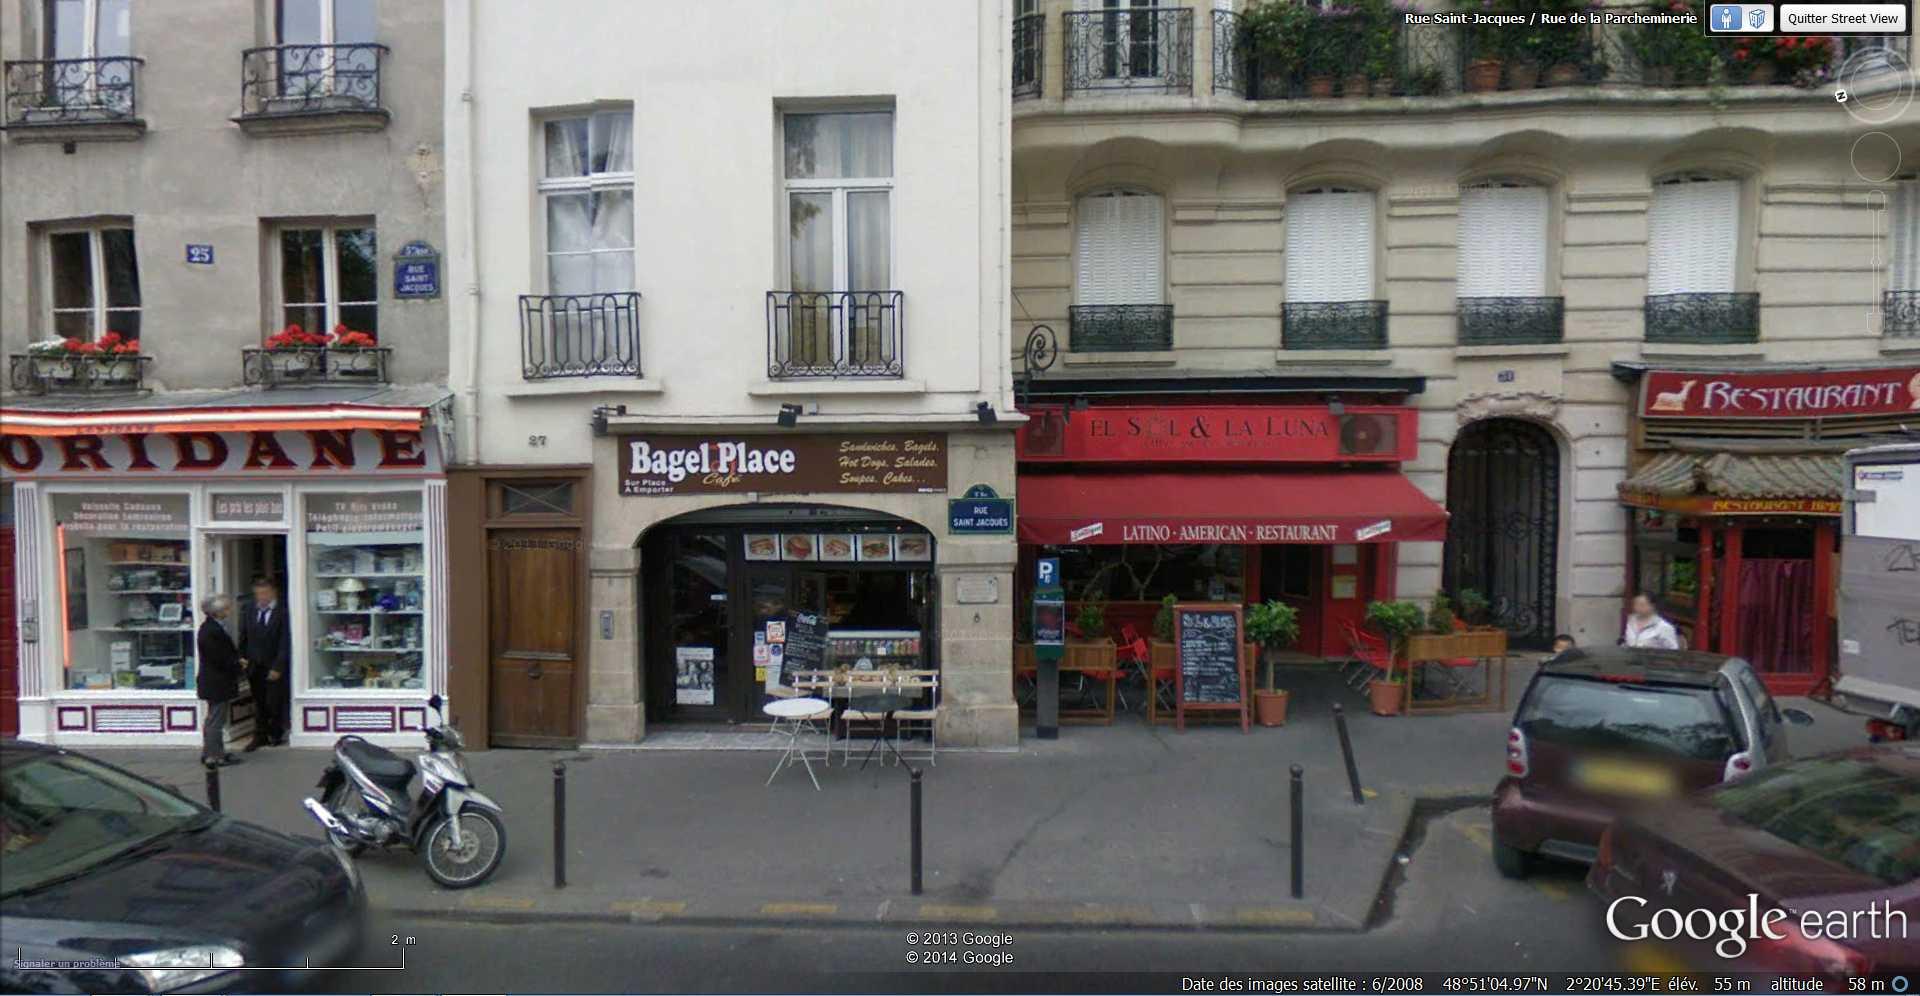 STREET VIEW: Les cadrans solaires en façade. 2014-052